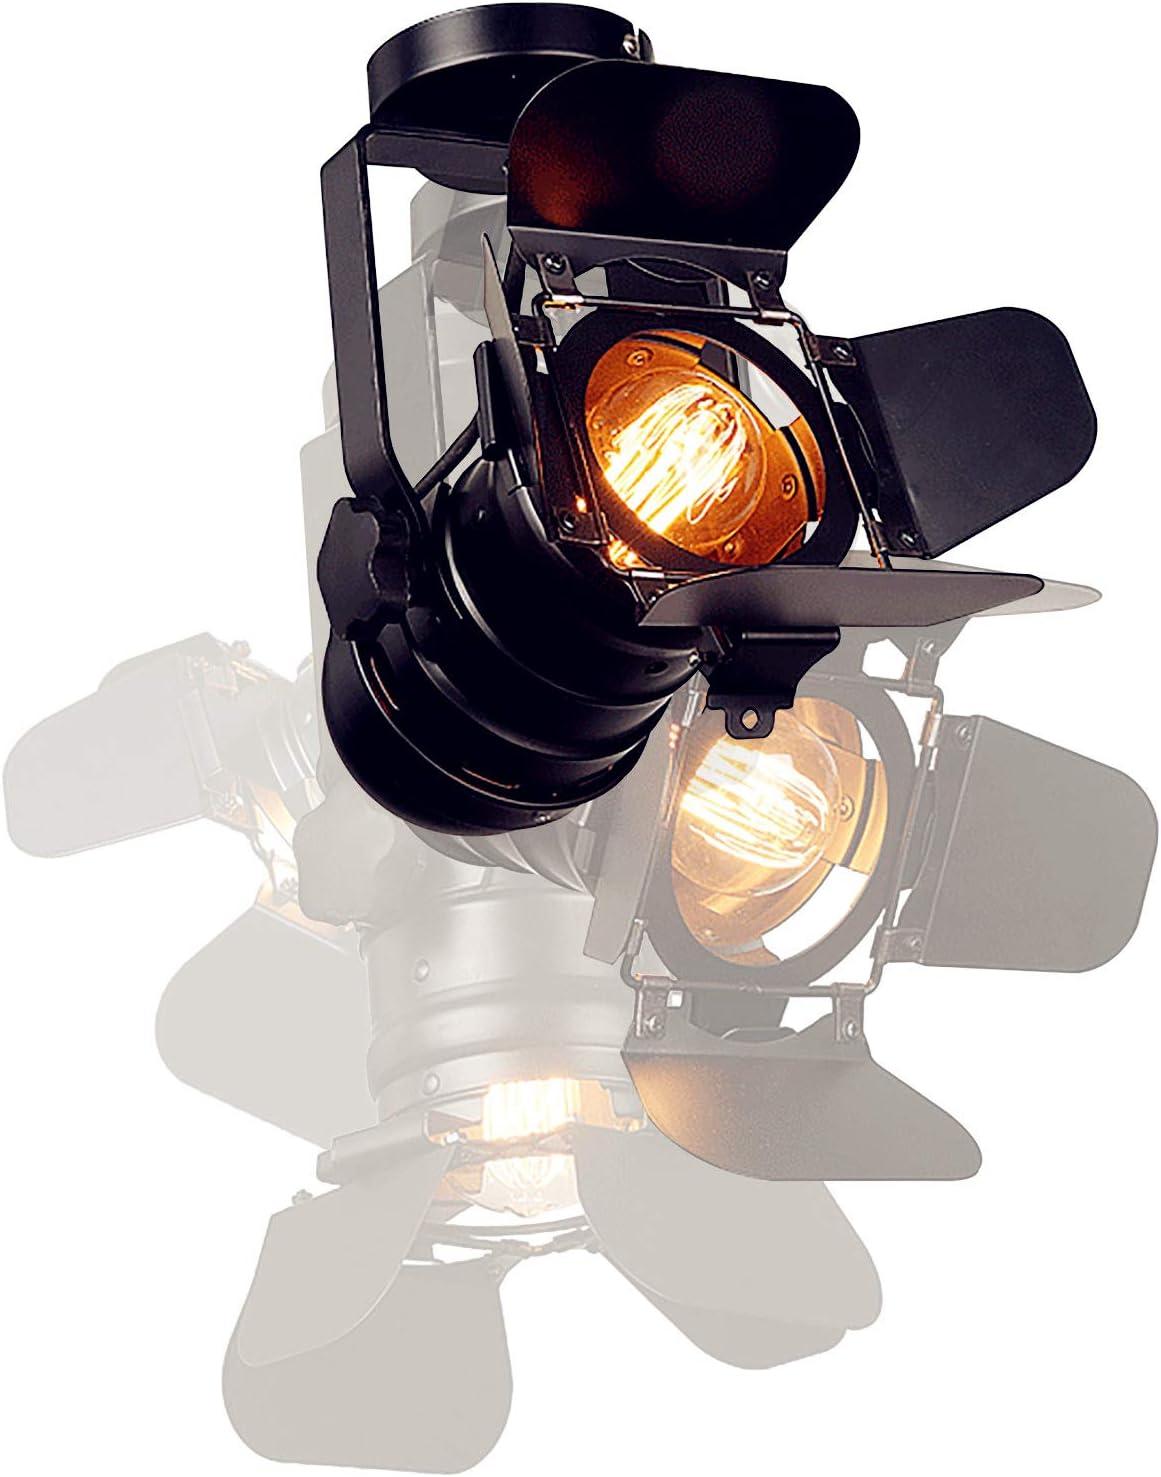 YUANKANG Black Cool Industrial Vintage Style Semi Flush Mount Loft Iron Track Lighting Fixtures, Adjustable Ceiling Shop Light/Wall Spotlight, E26 LED Pendant Lights for Home (Bulb Not Included)